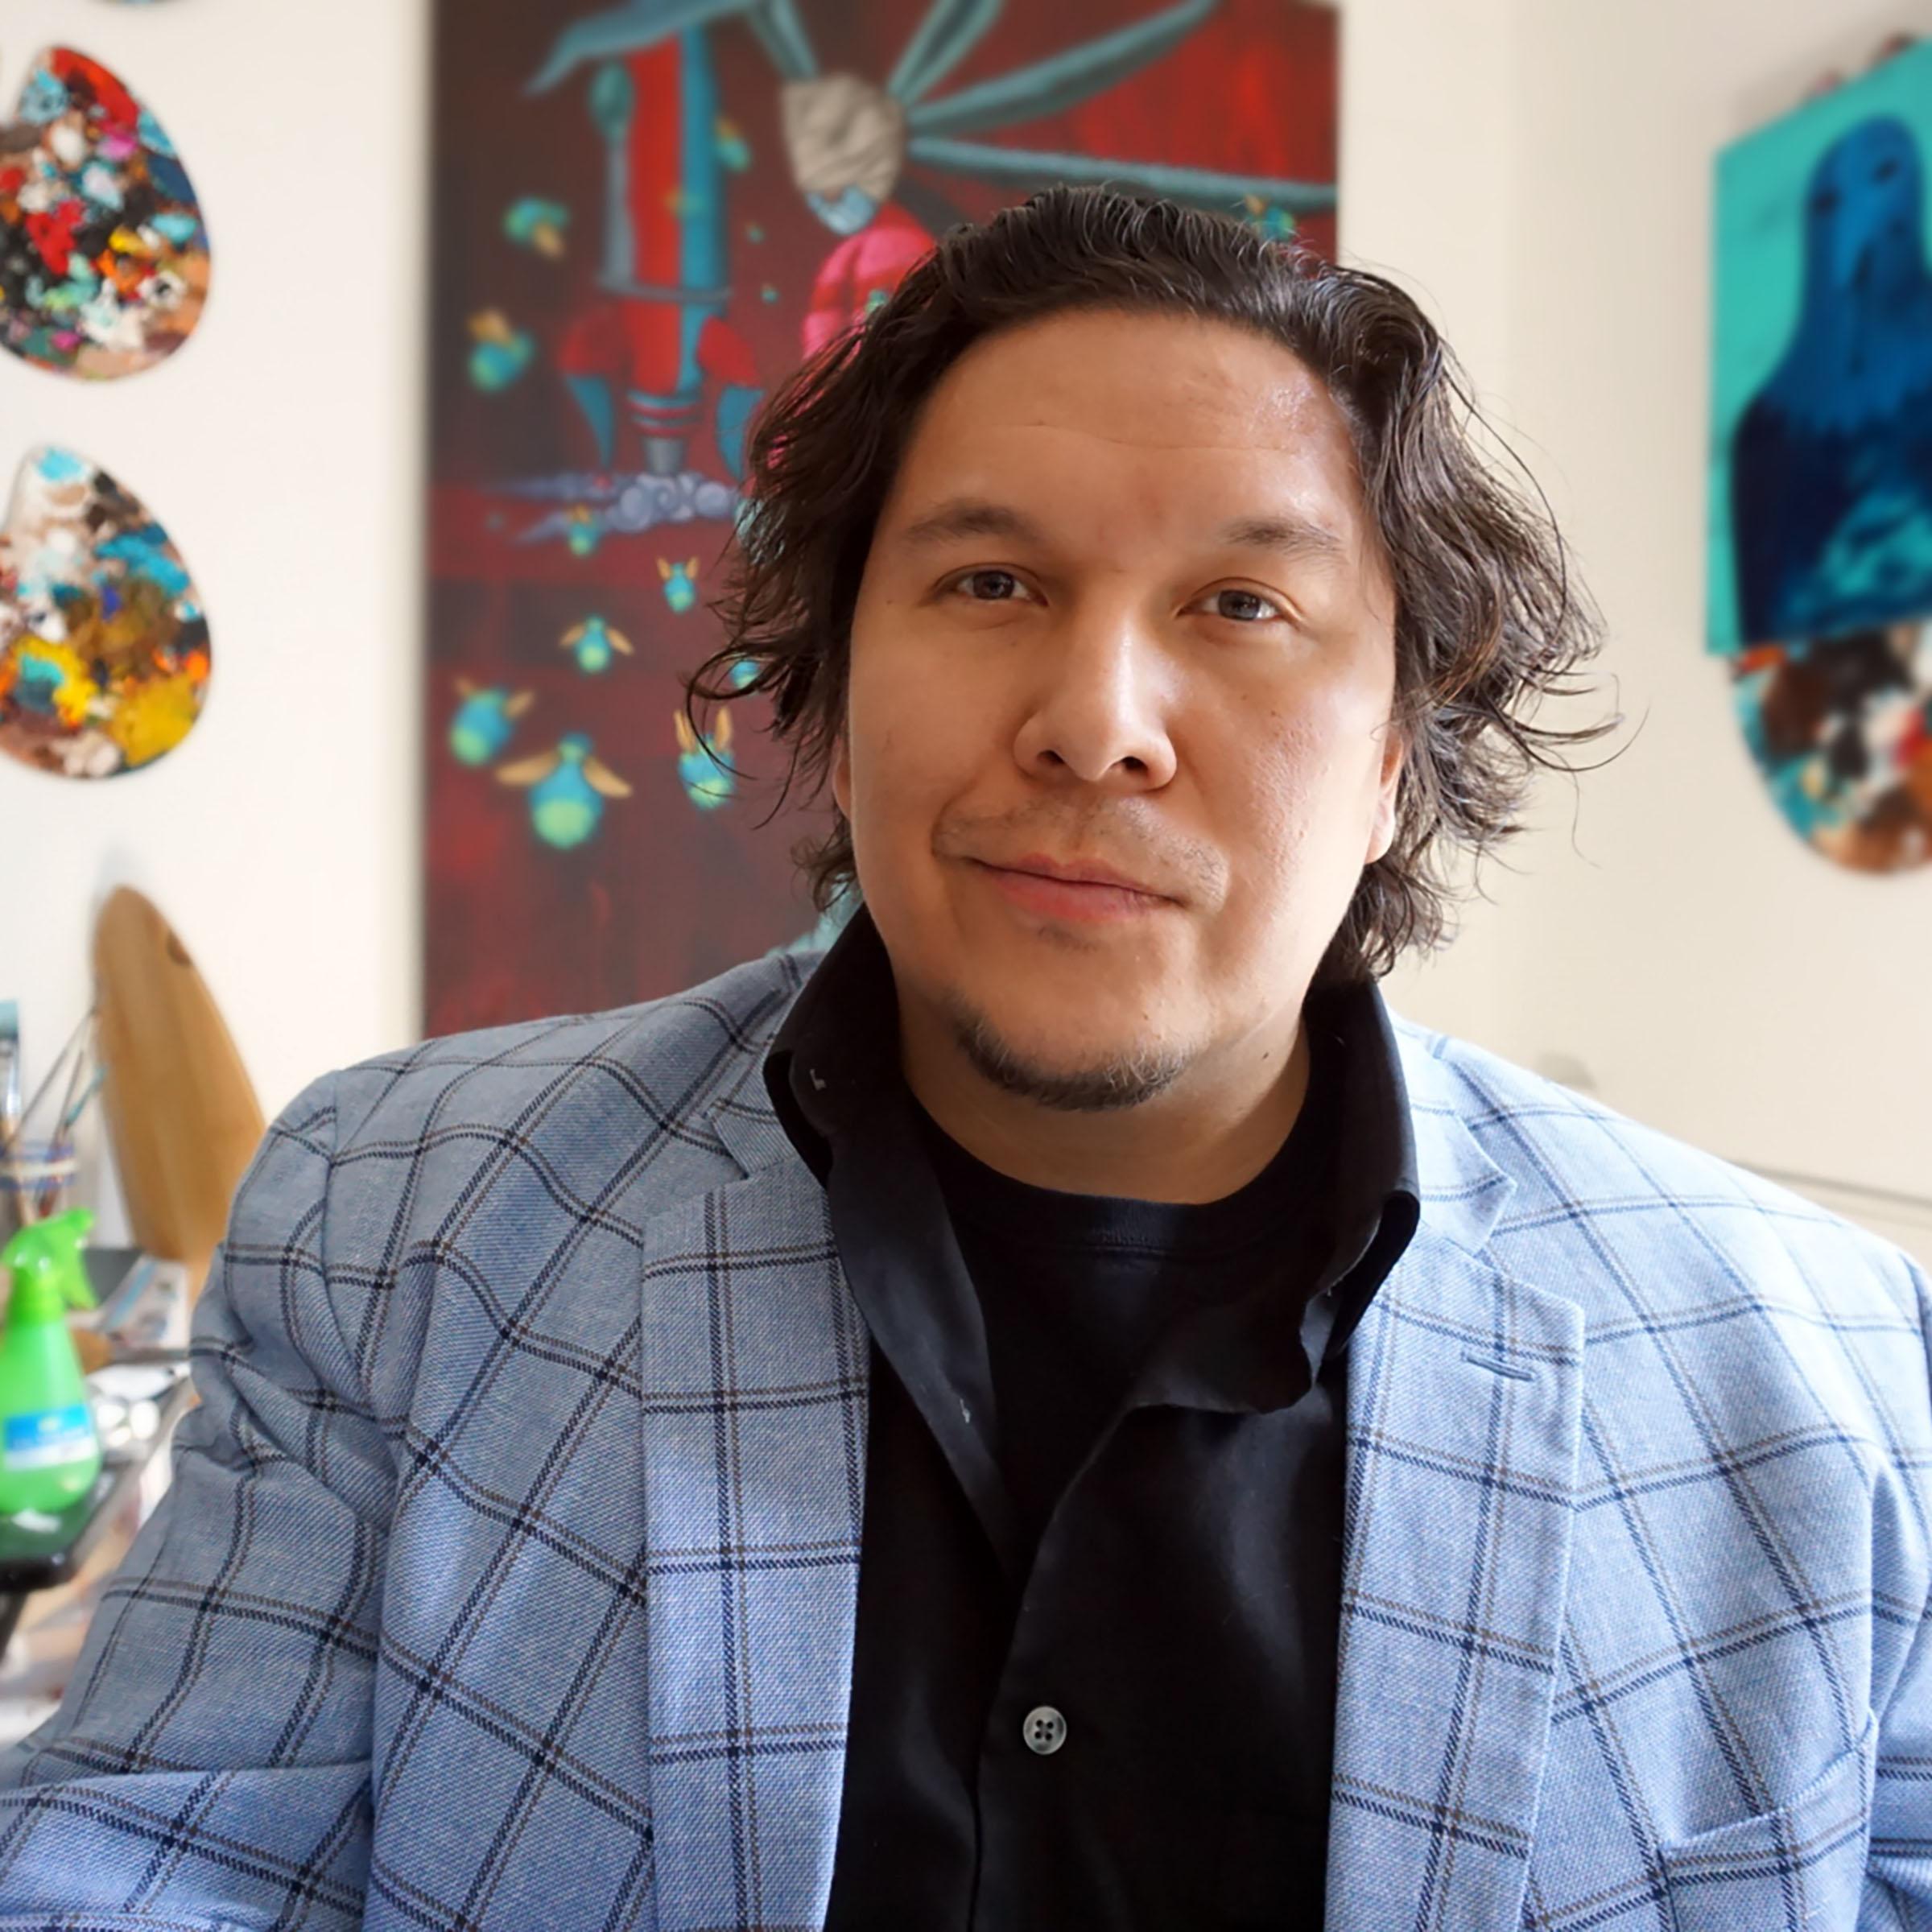 KBFT MN Artist Profiles – Jonathan Thunder